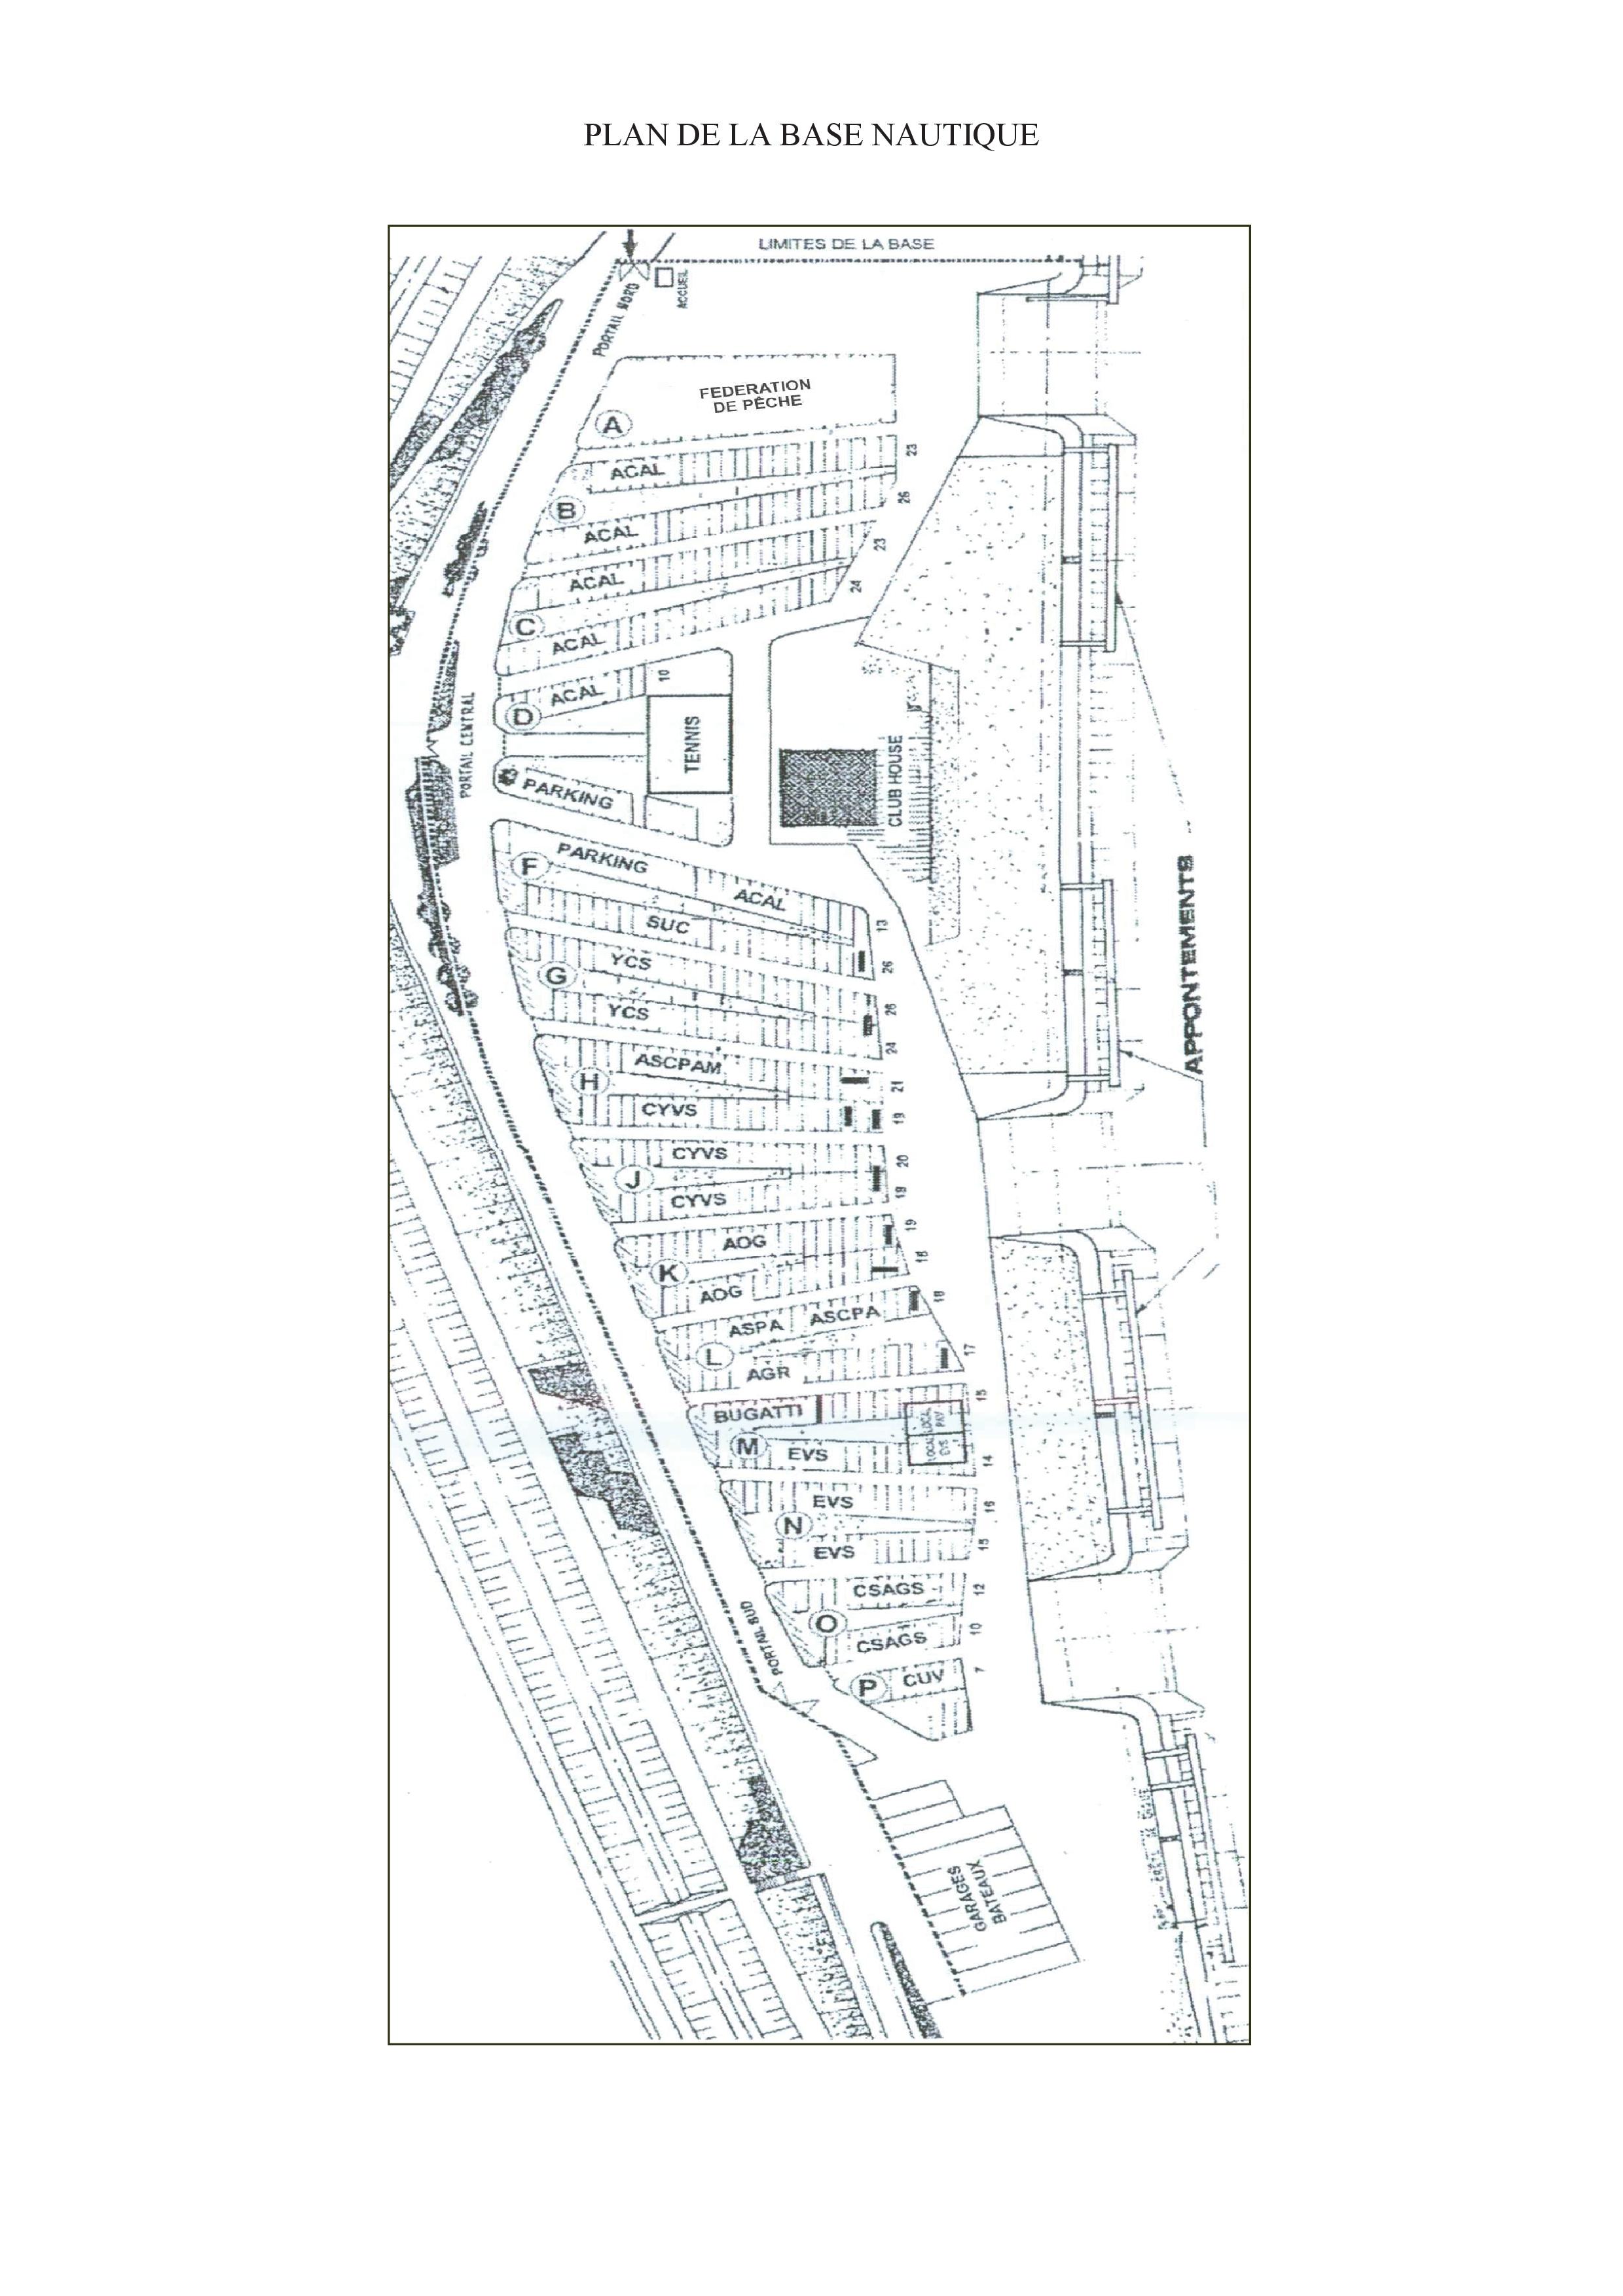 Plan de la Base Nautique de Plobsheim.